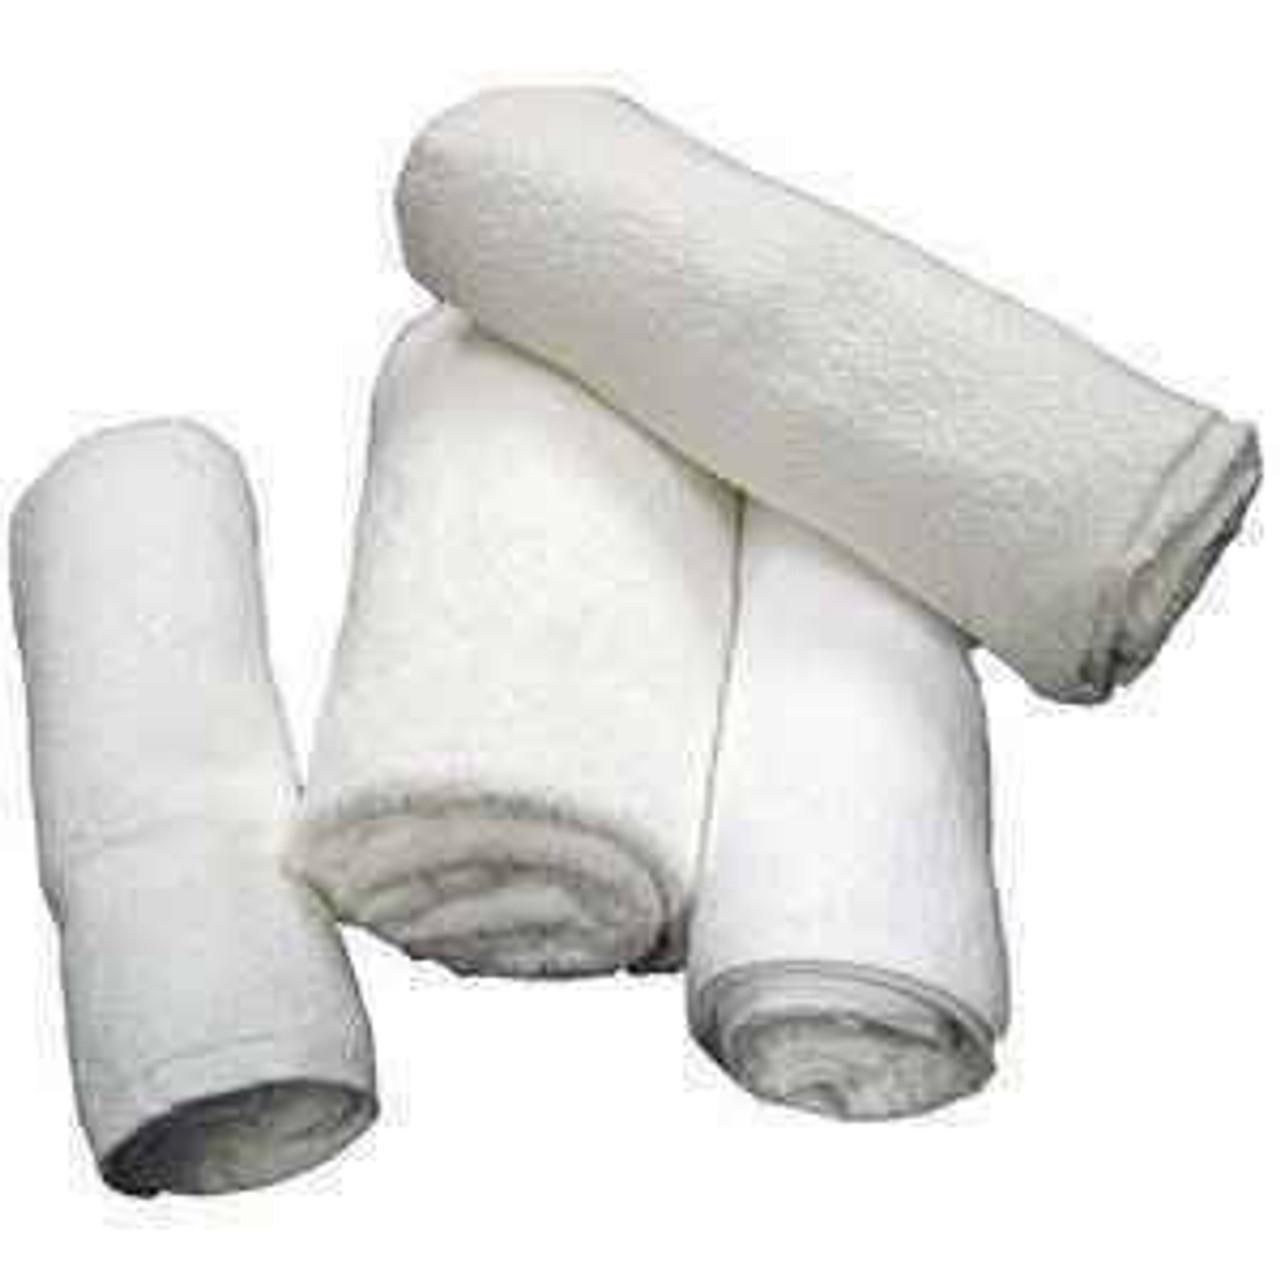 Ganesh Mills or Oxford Super Blend Ganesh Mills or Magic Super Pool Towels or Pack of 3 DZ